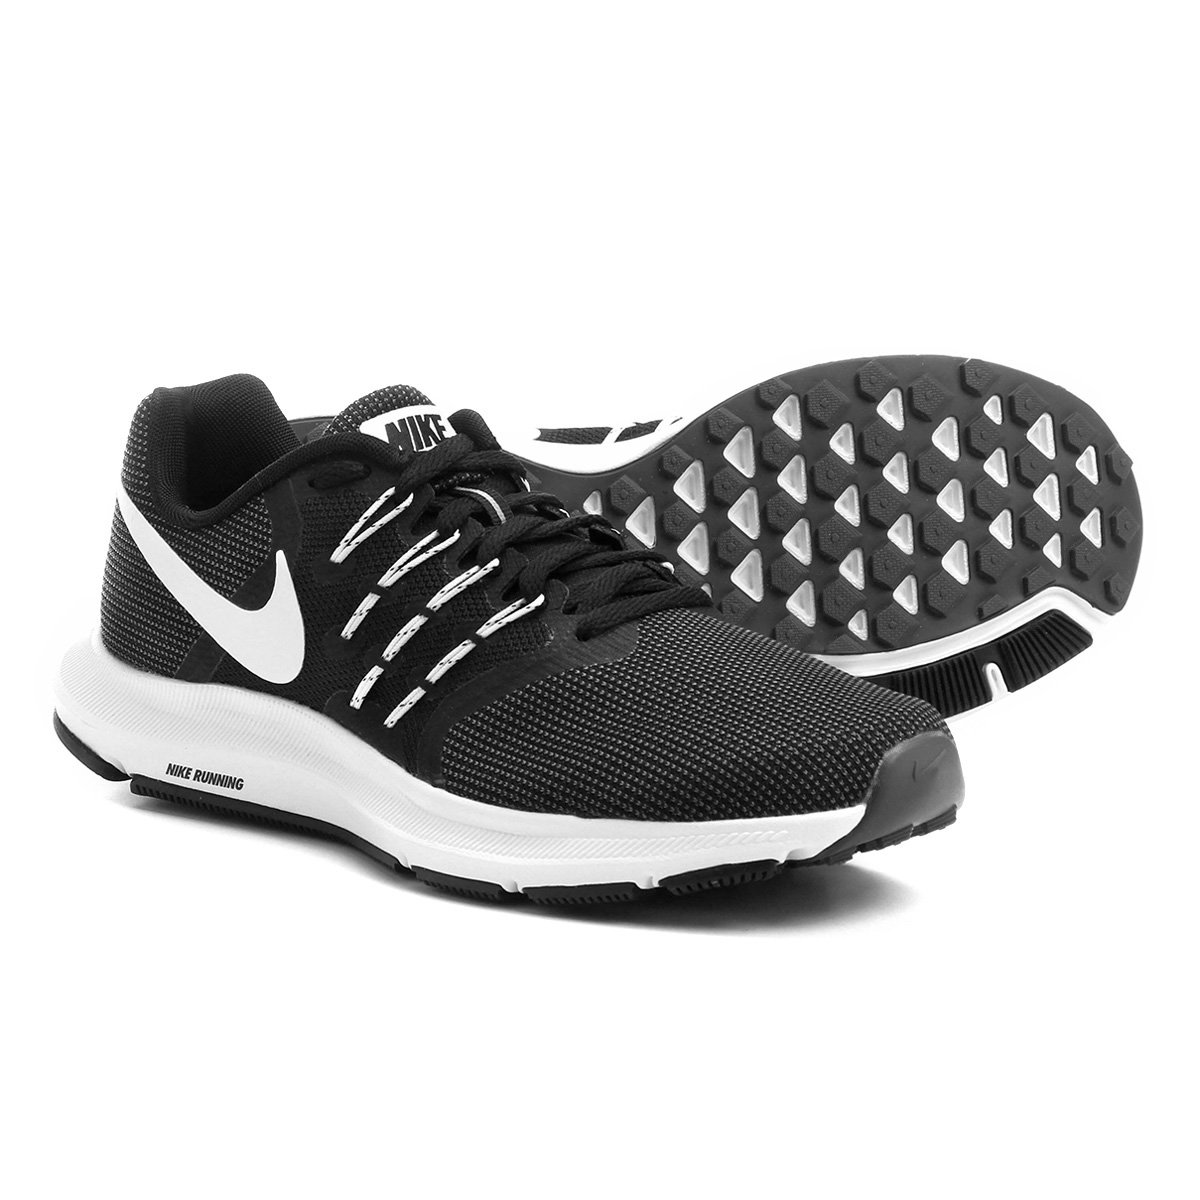 Tênis Nike Run Swift Feminino - Compre Agora  43b22303e86a9